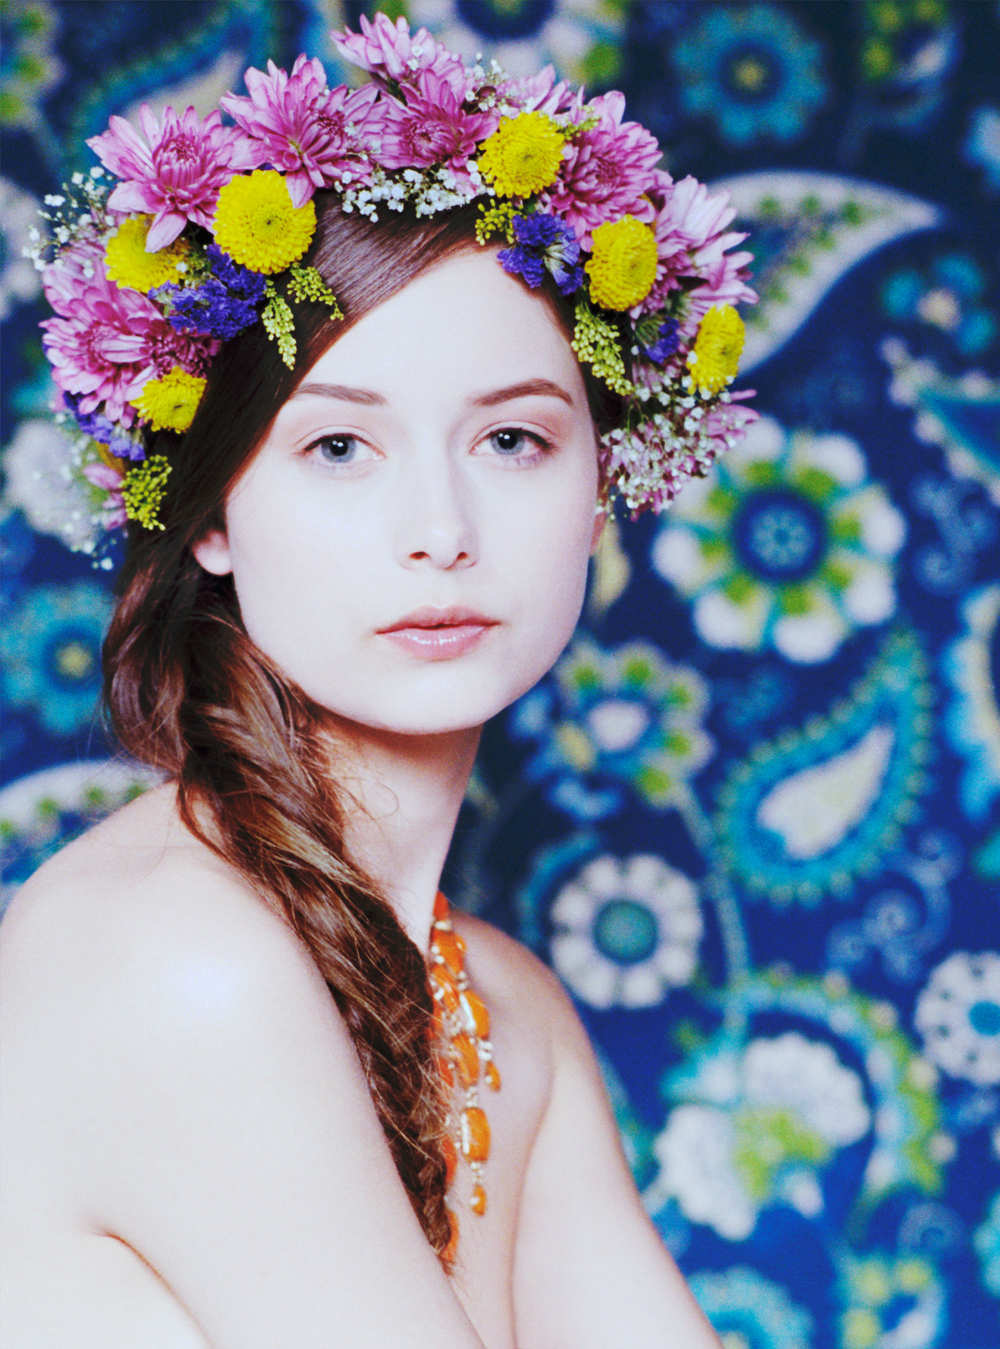 cait_flowerCU.jpg